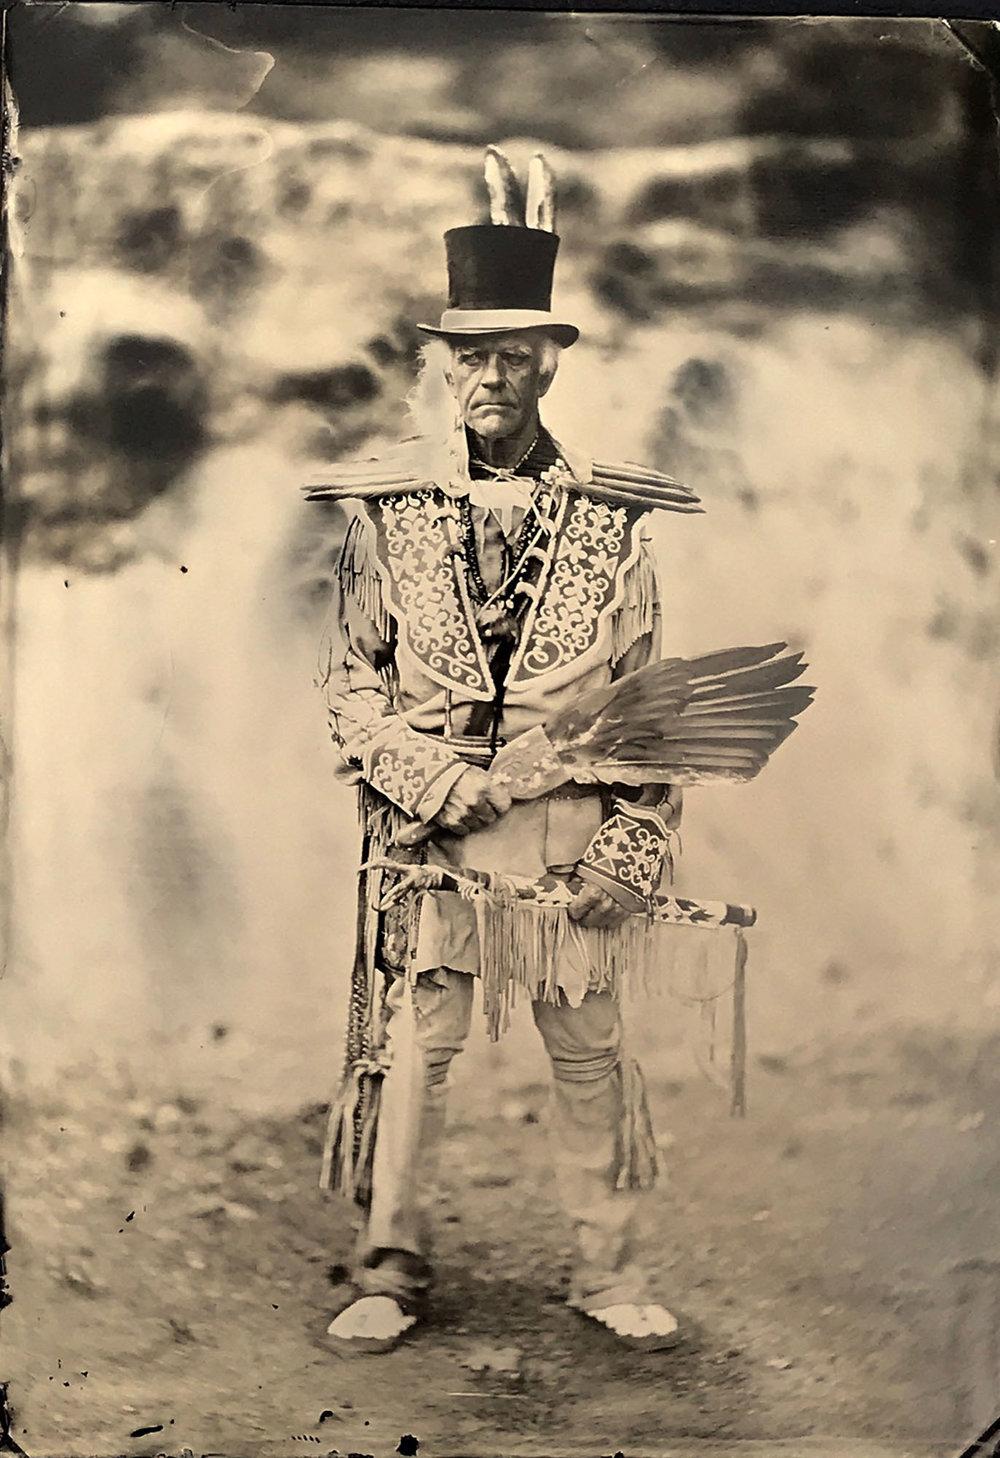 Title : Native American Reenactor   By: Craig Murphy    Www.glensfallsart.com